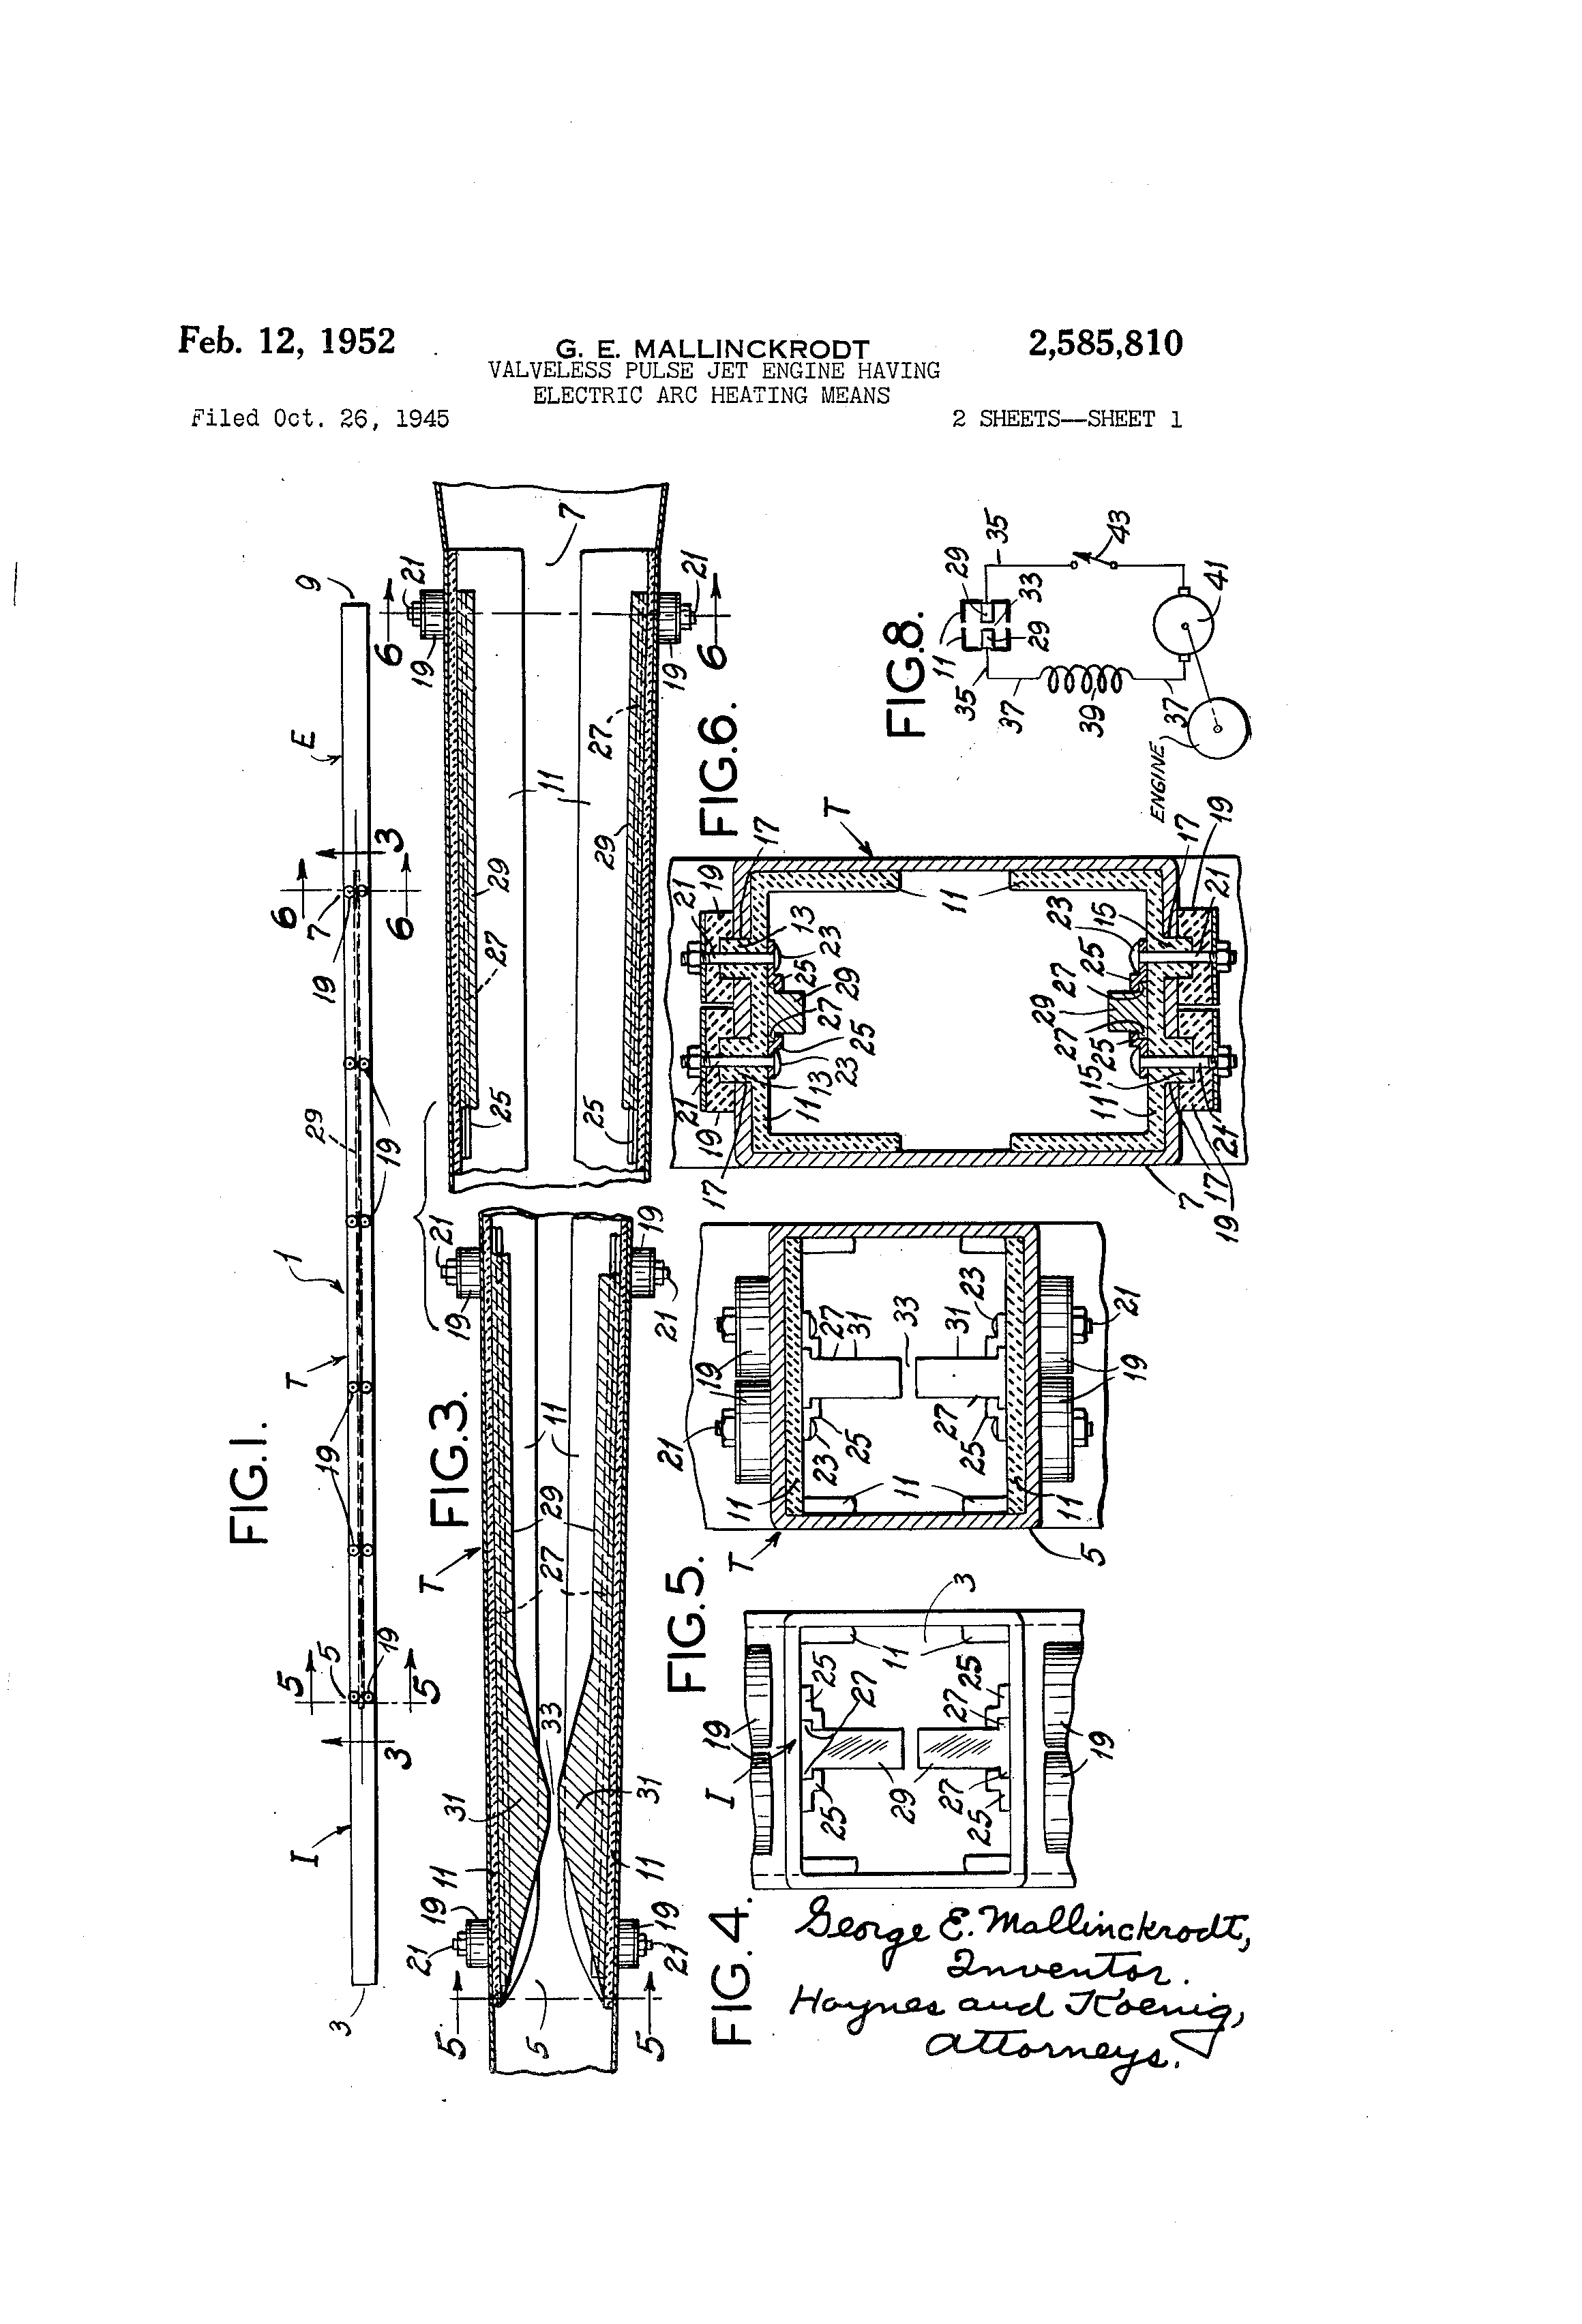 patent us2585810 - valveless pulse jet engine having electric arc heating means